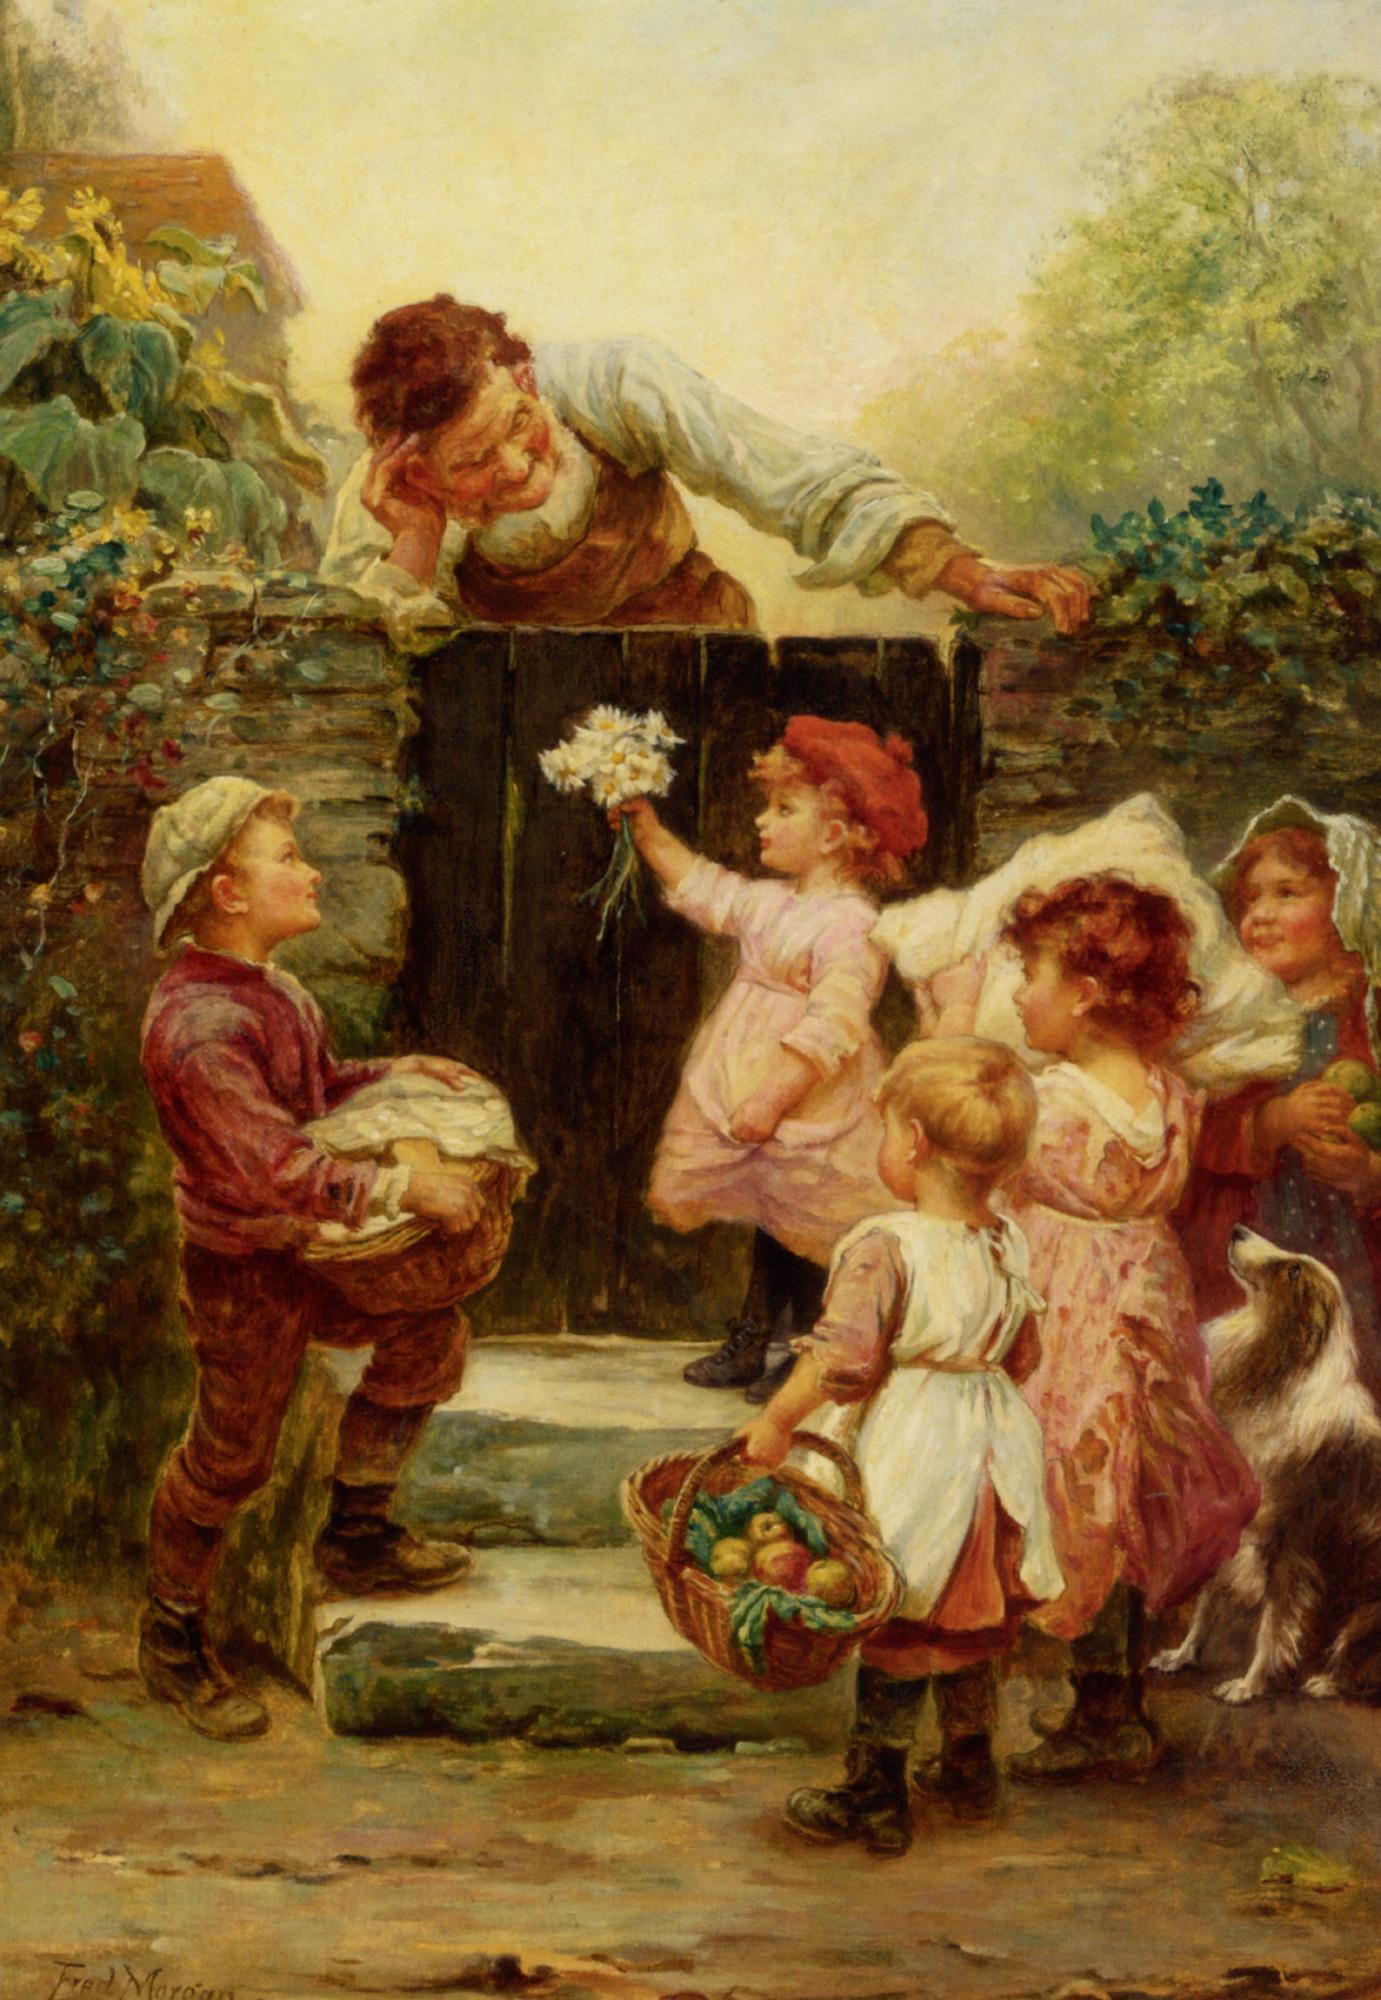 Grandfathers Birthday :: Frederick Morgan  - Children's portrait in art and painting ôîòî